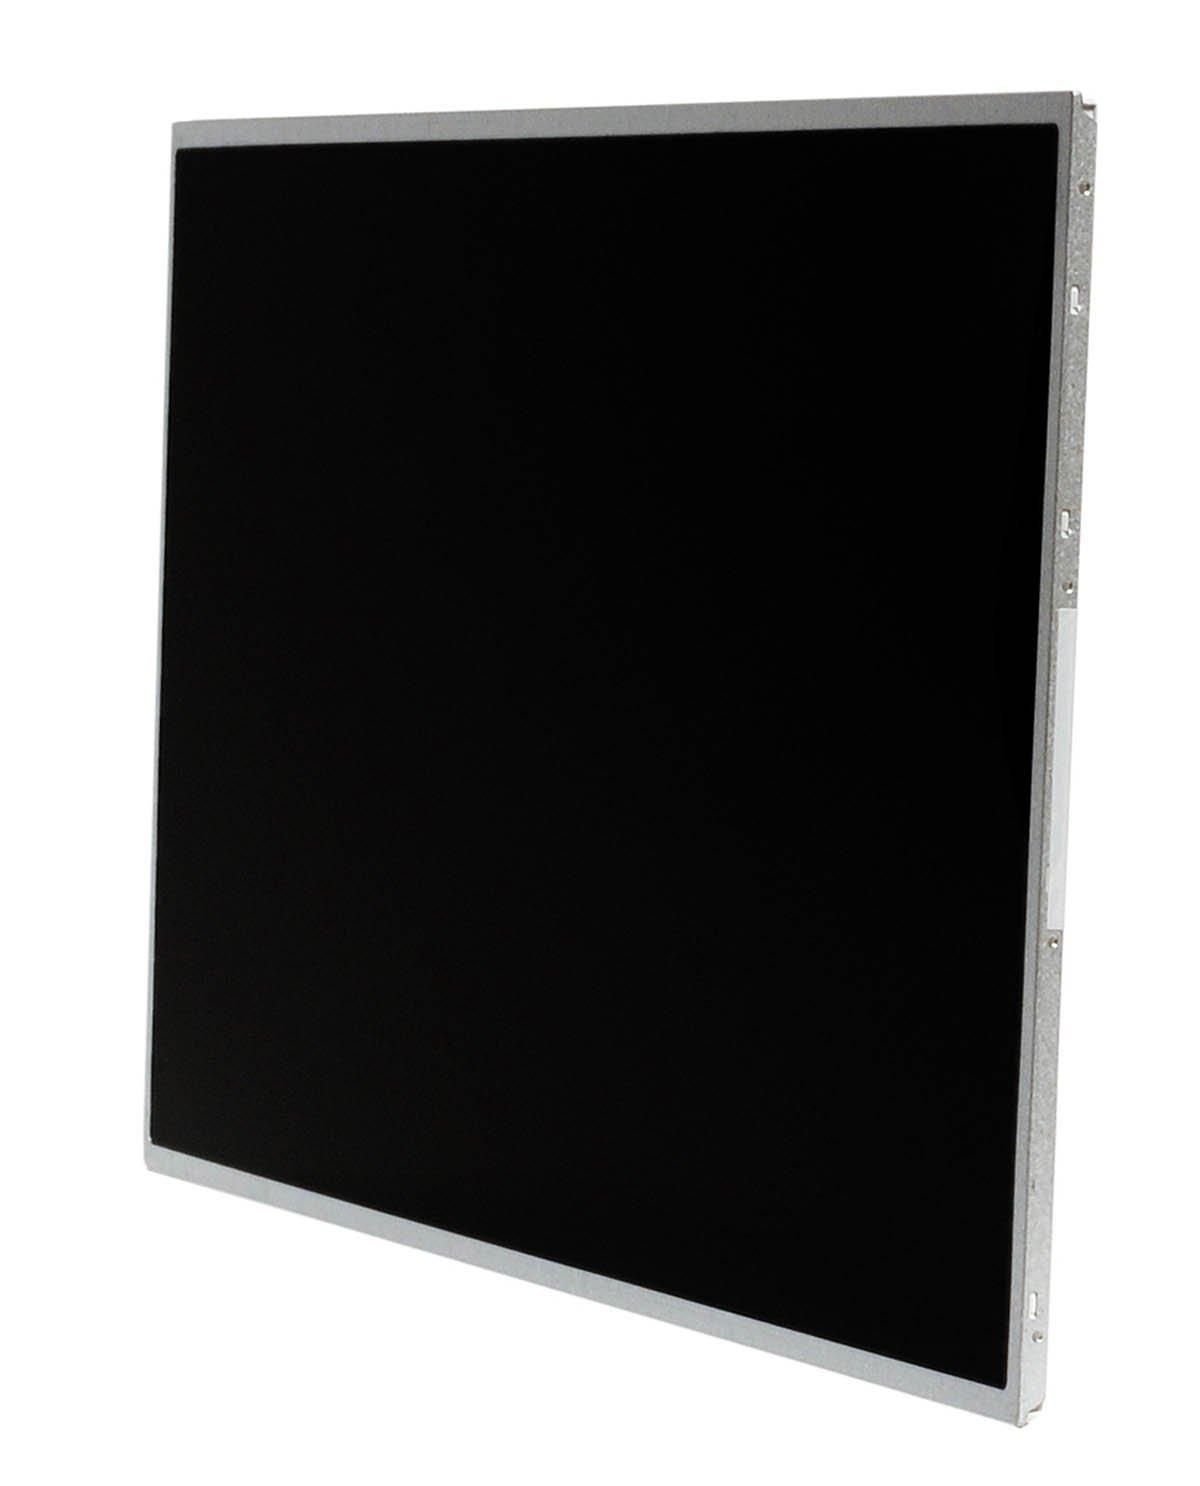 LAPTOP LCD SCREEN FOR ASUS X5DAF X5DIM A53U A53U-XE2 A53U-ES01 15.6 WXGA HD LED